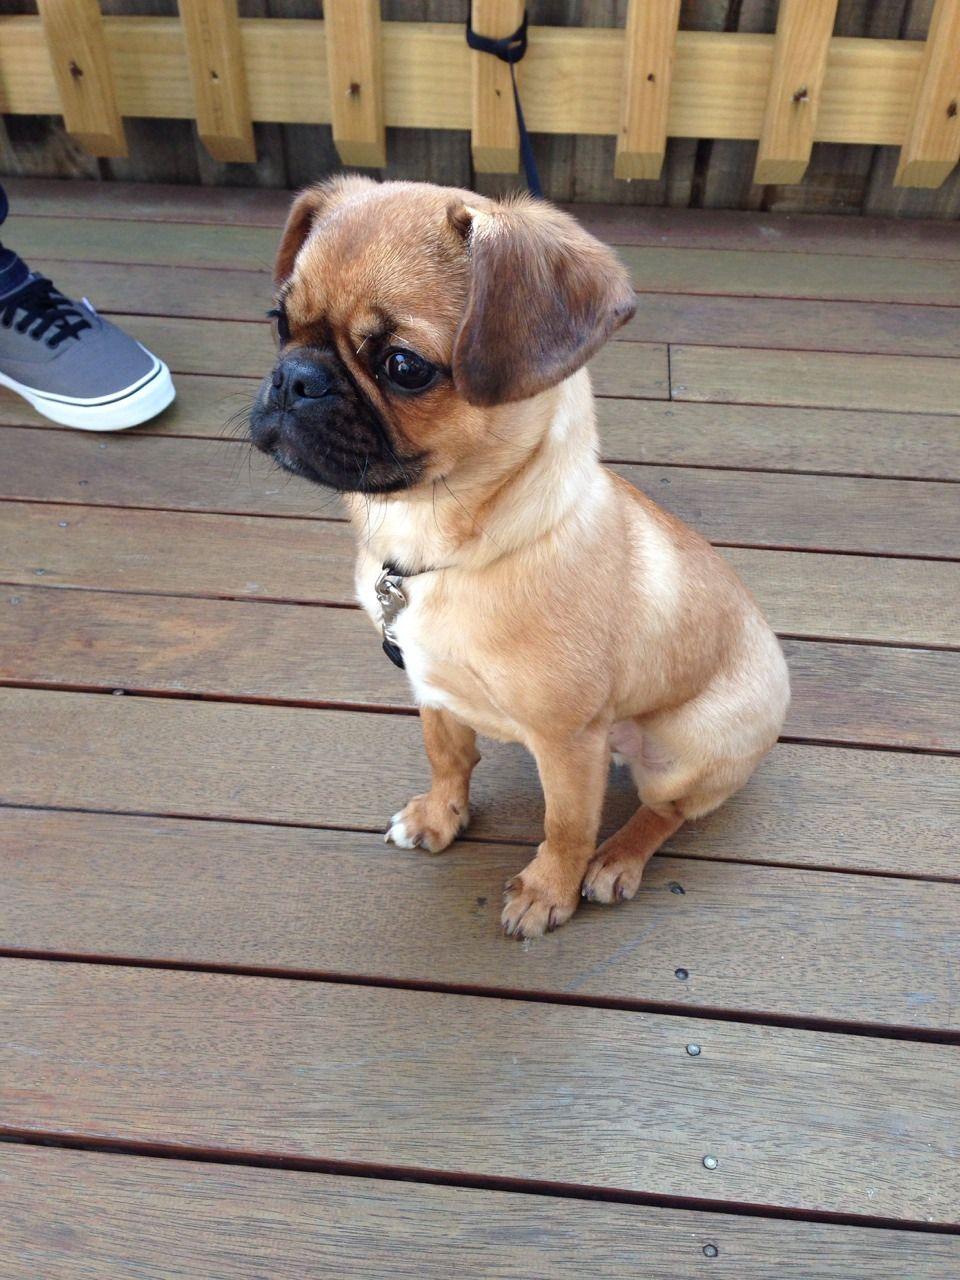 Pugalier Pug X King Charles Cavalier I Want One So Bad Cute Dog